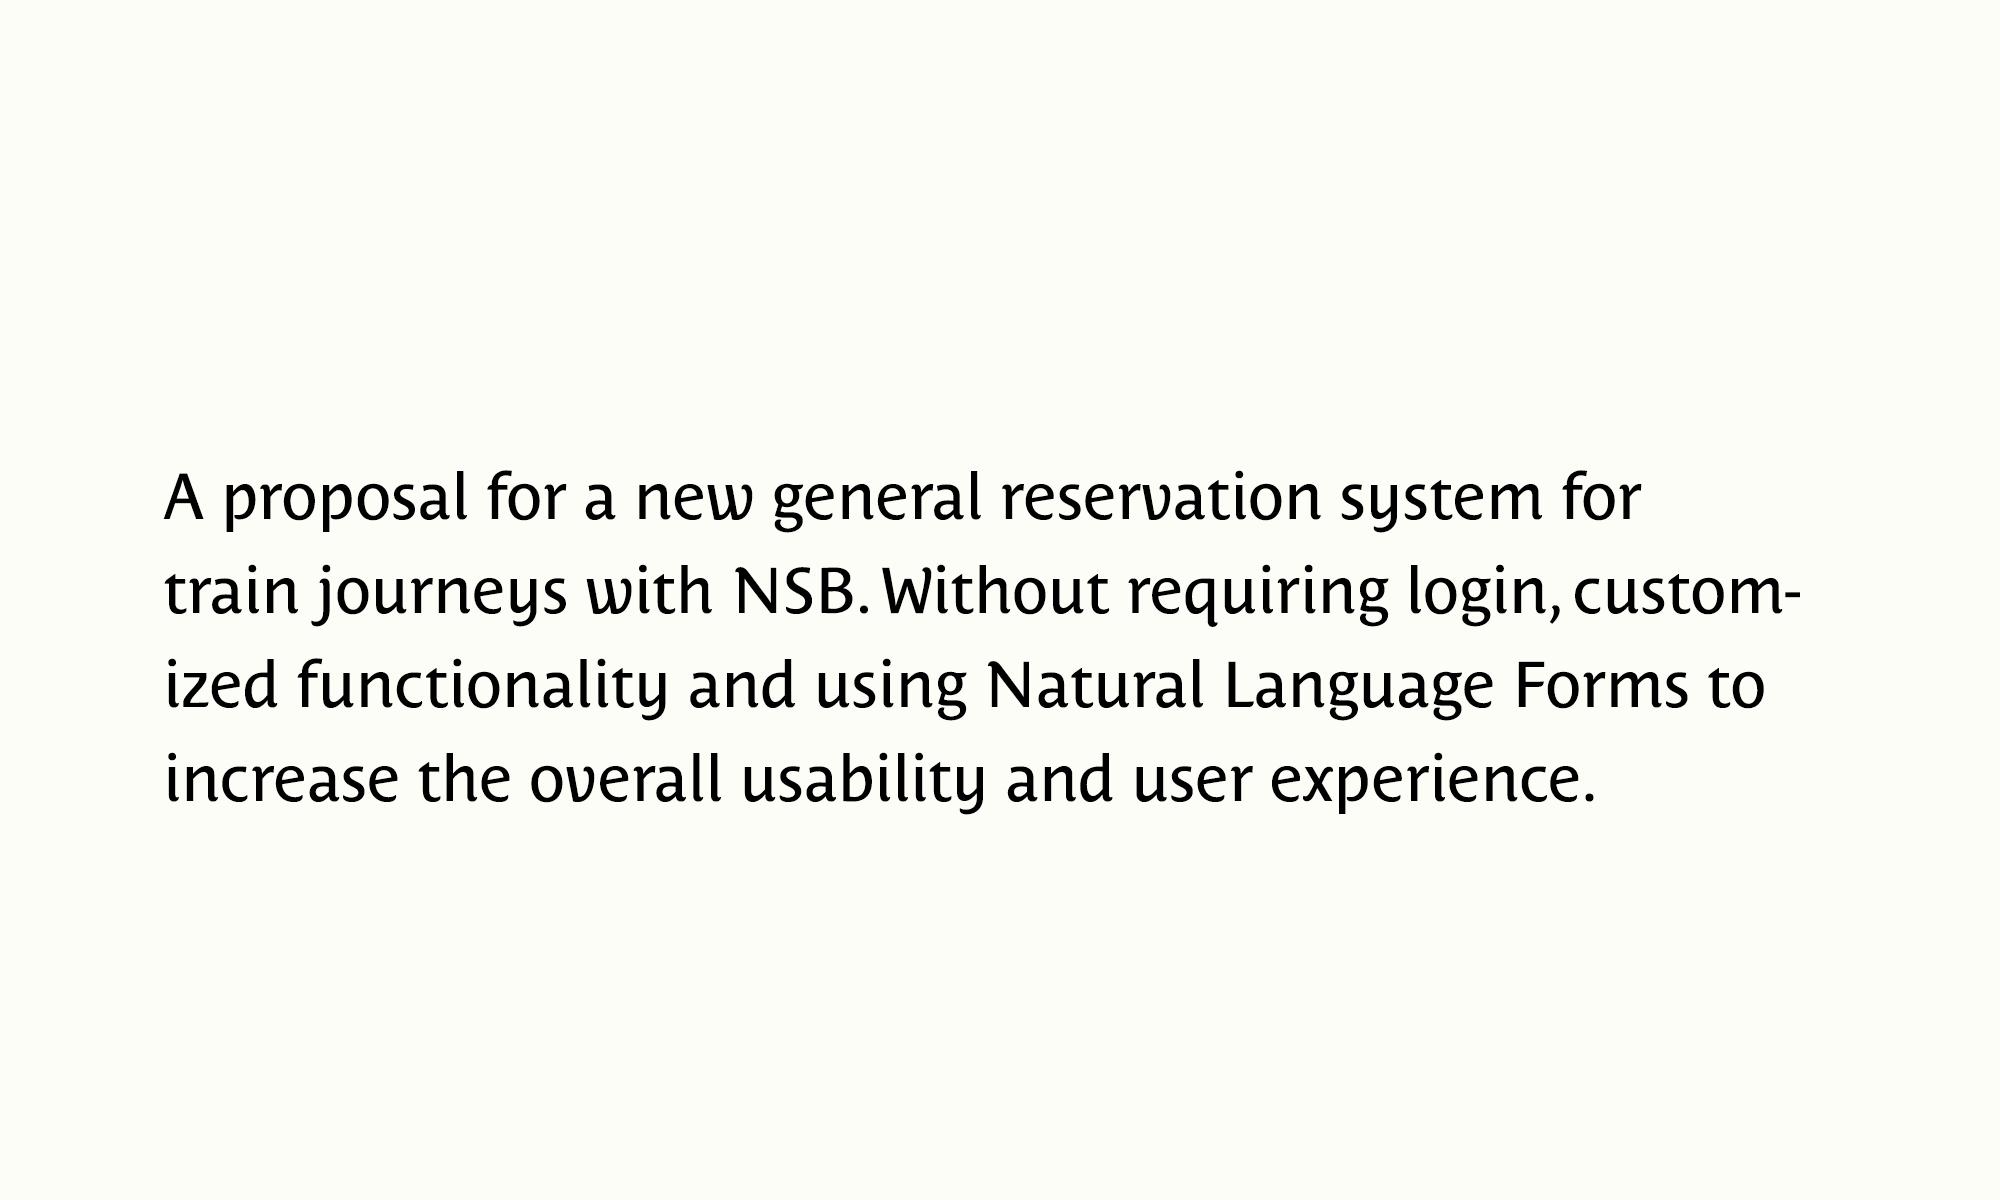 Neno Mindjek - NSB - Reservation system